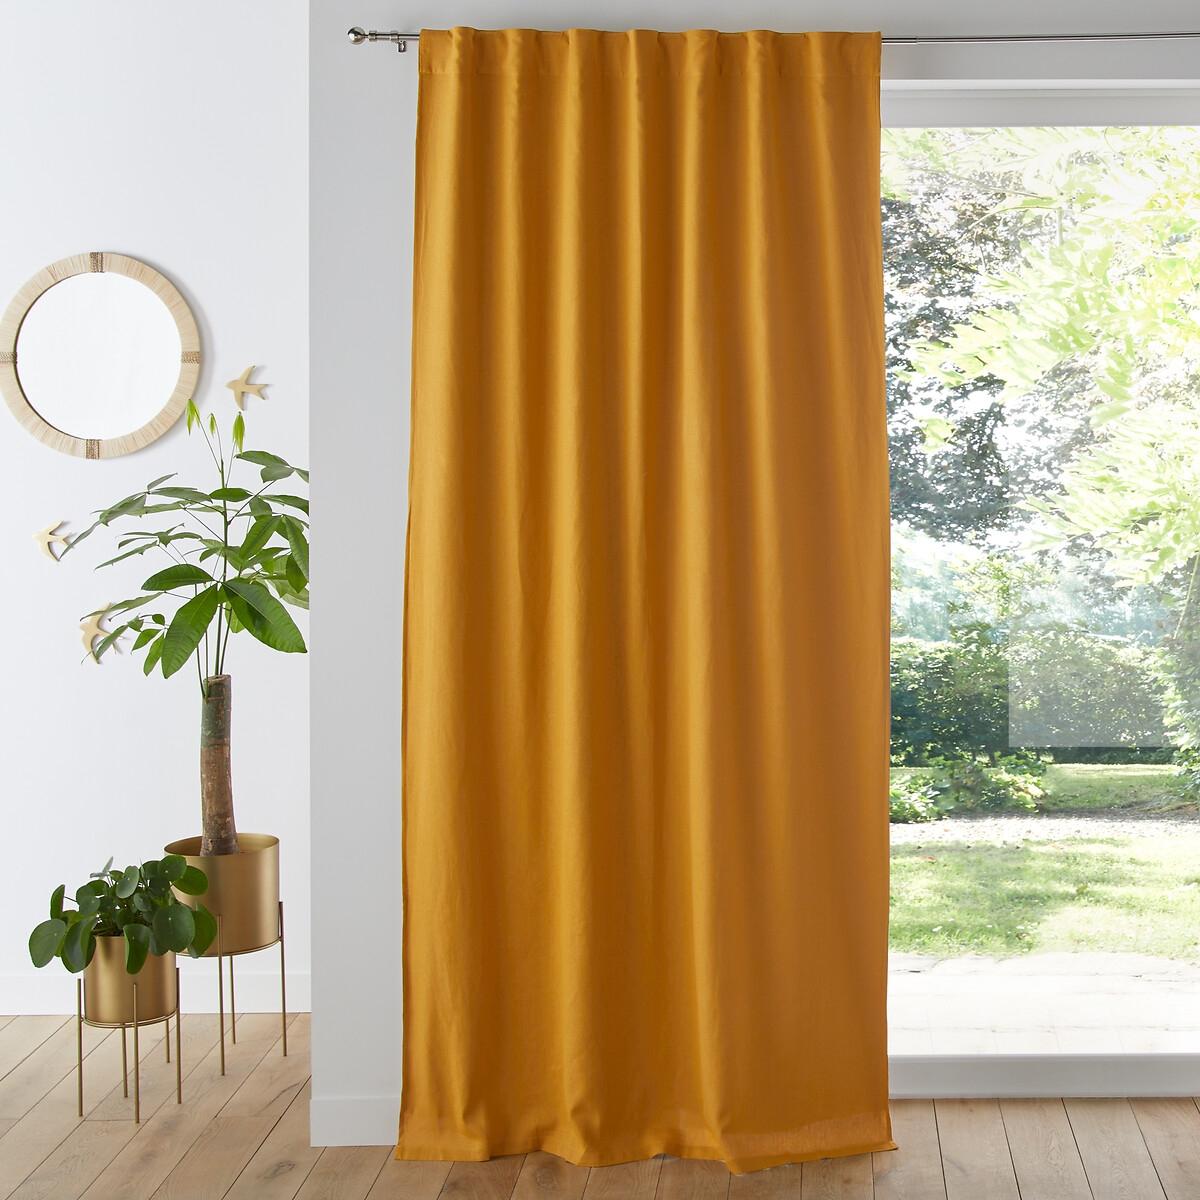 Занавеска LaRedoute Затемняющая из льна и вискозы Odorie 180 x 135 см желтый